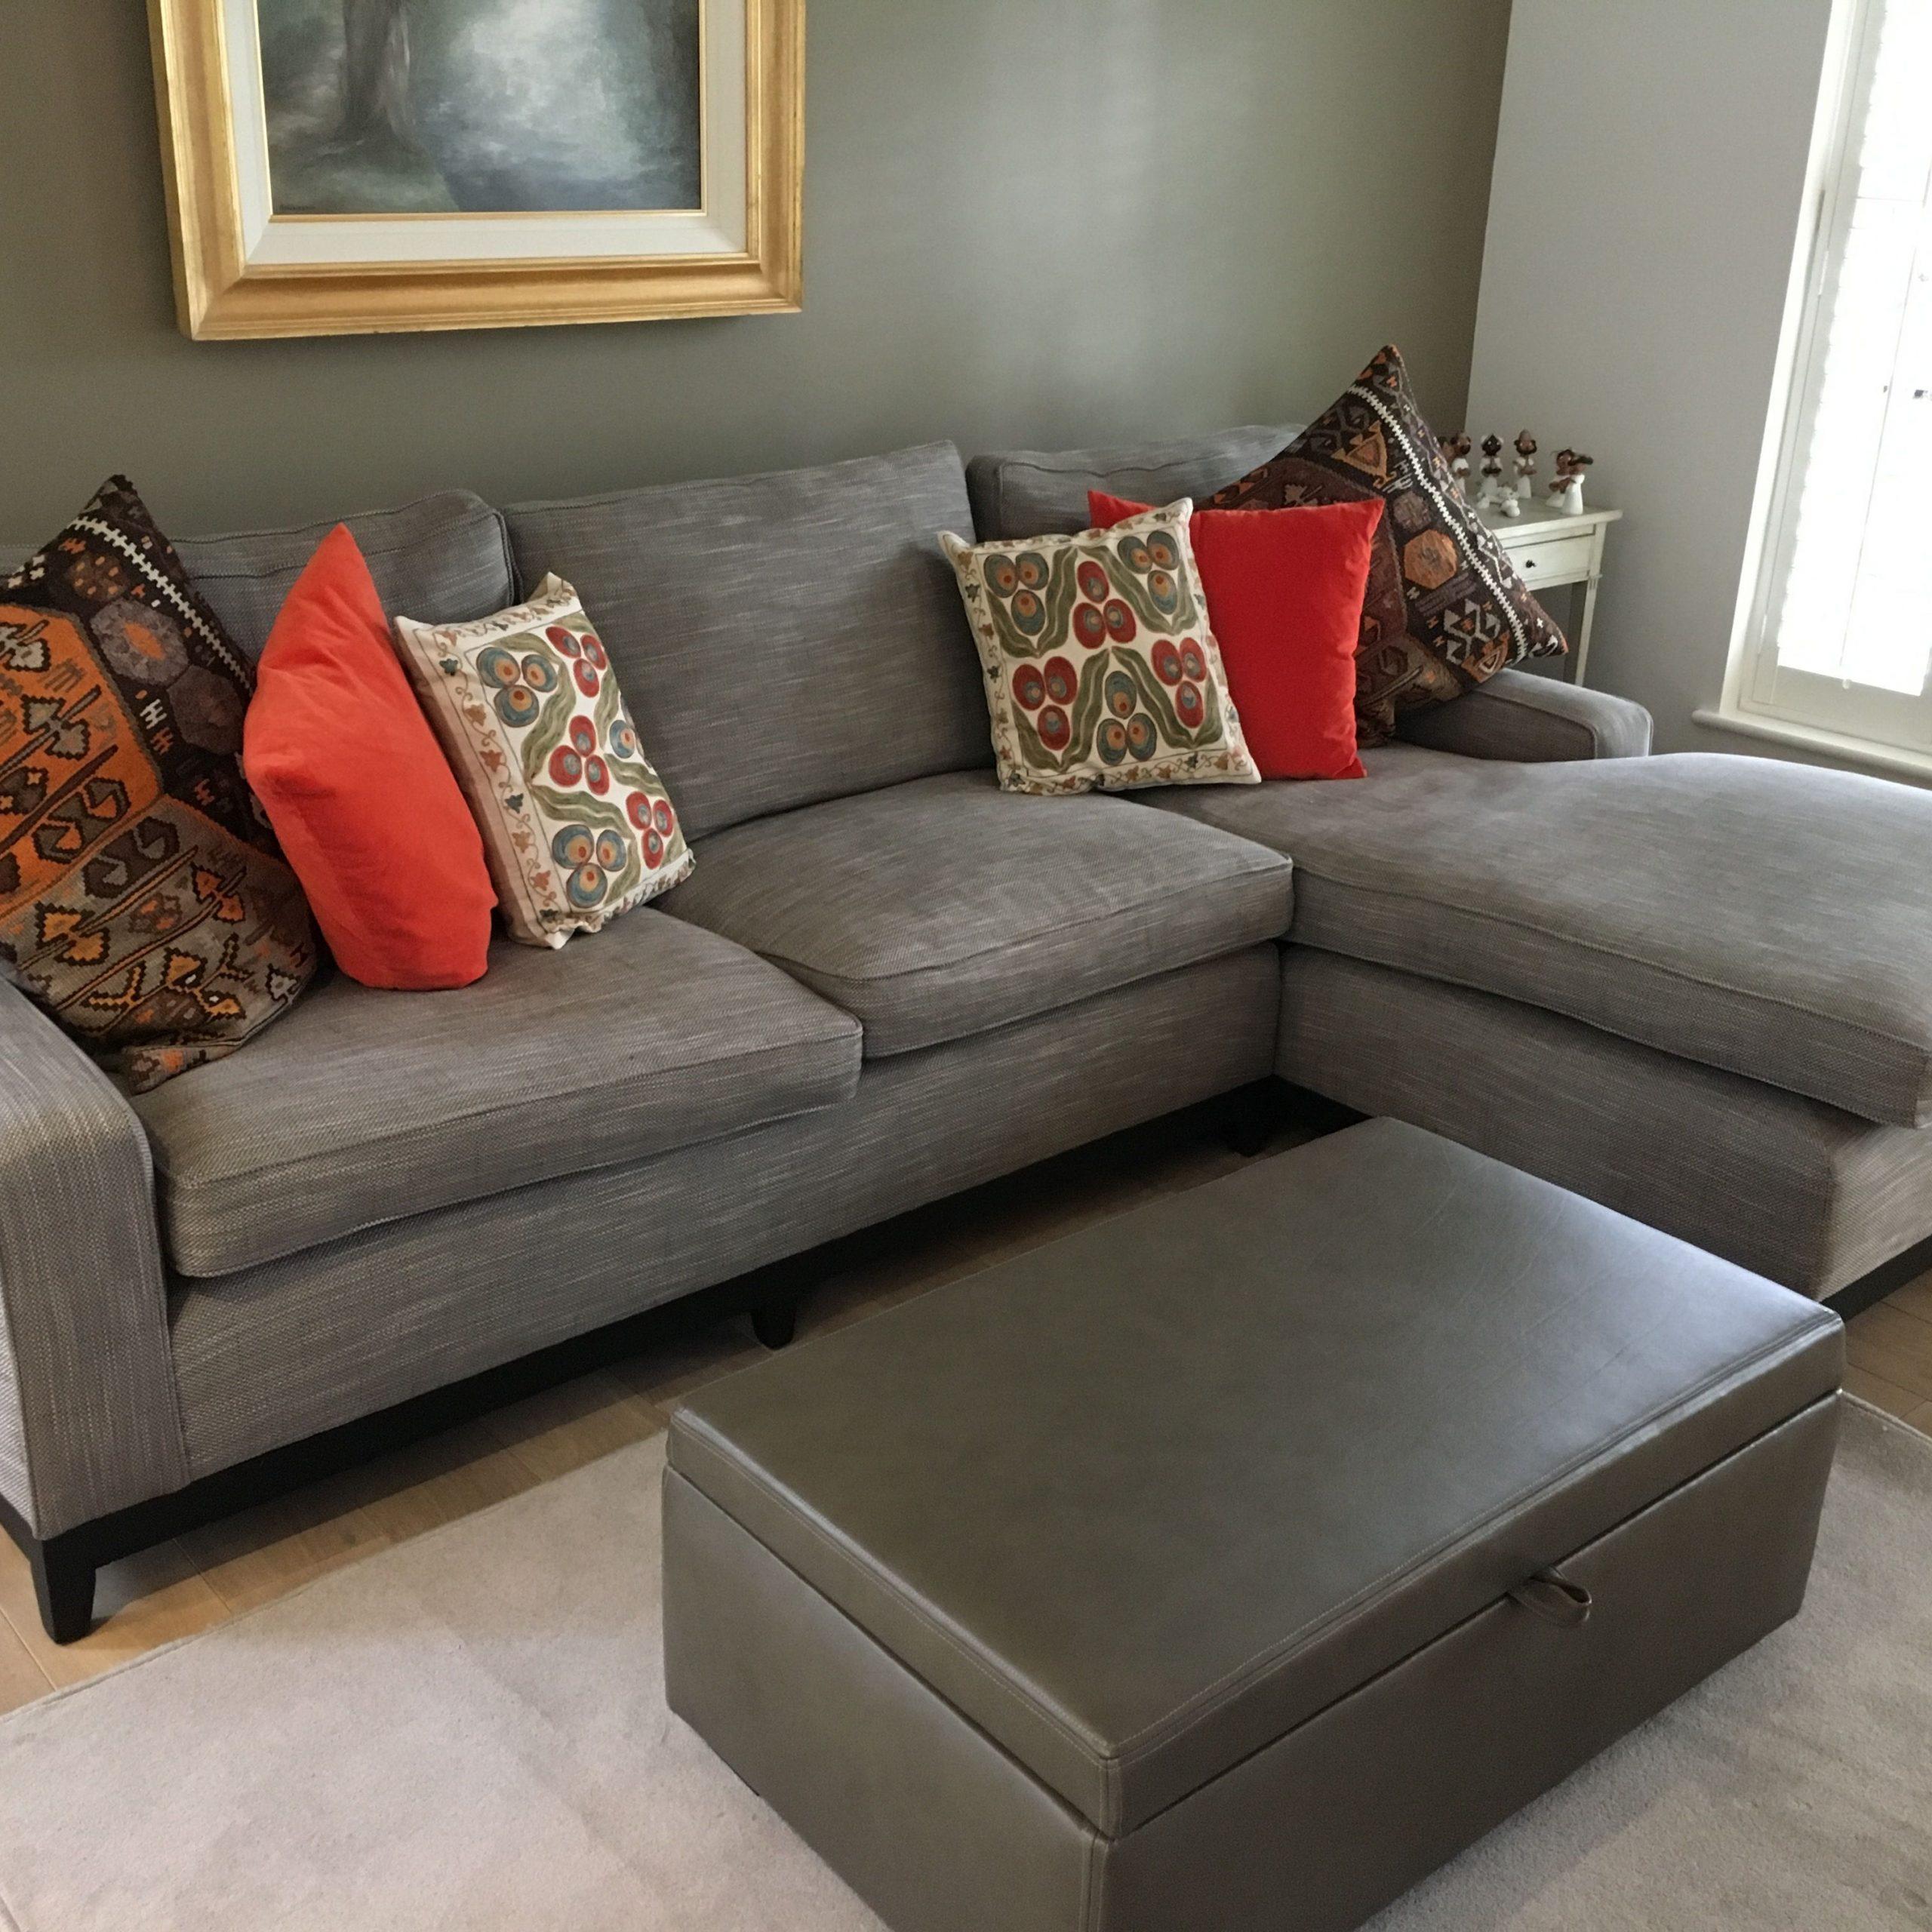 Custom Made L Shape Sofa Upholstered In Gp & J Baker In Custom Made Sectional Sofas (View 6 of 15)